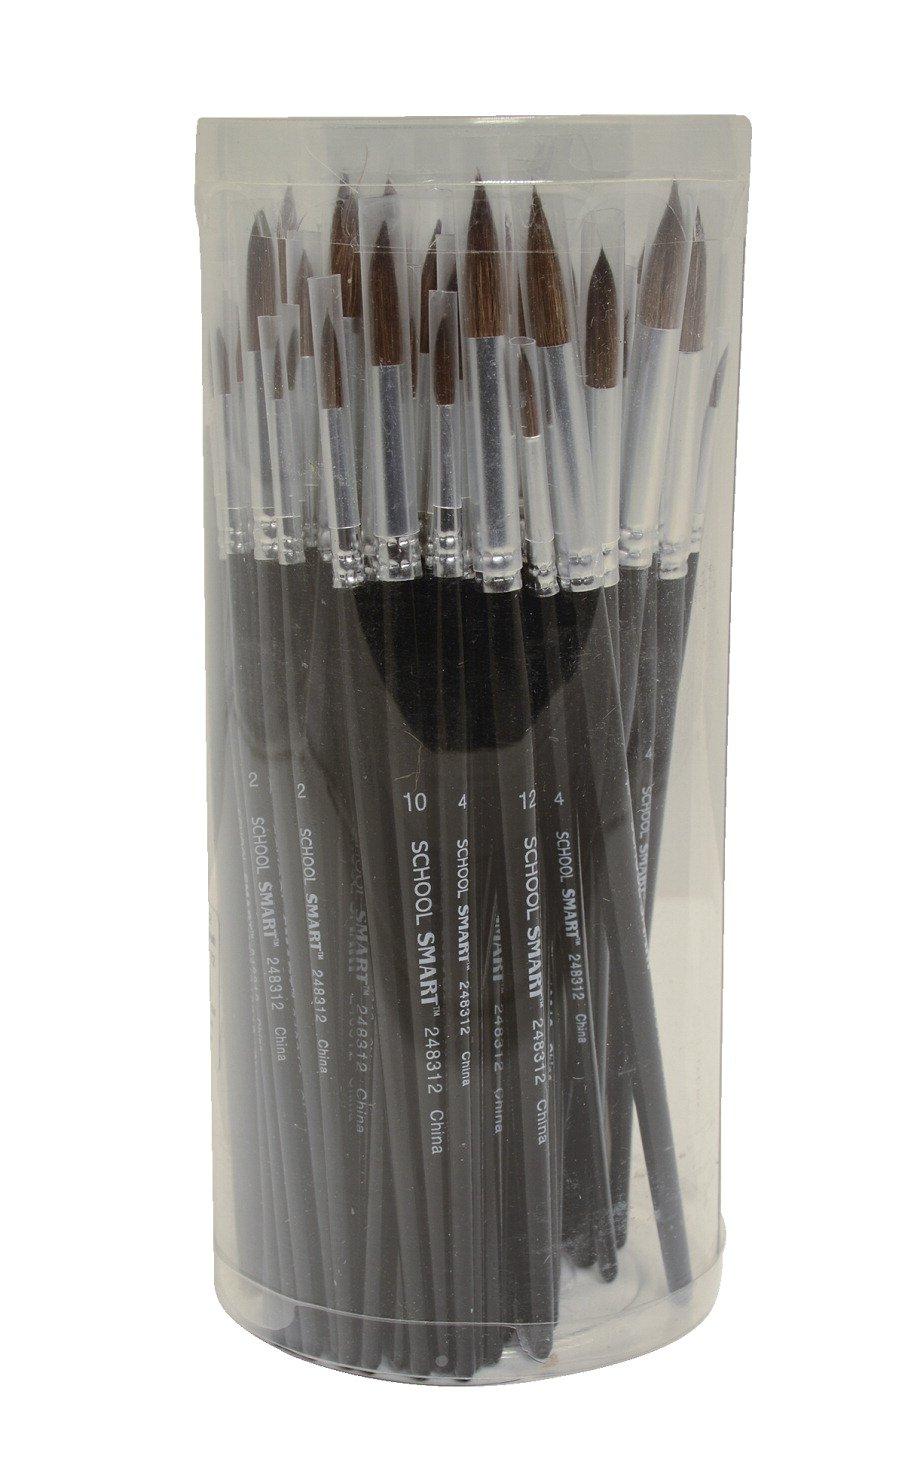 School Smart 248312 Camel Hair Watercolor Brush - Assorted Sizes - Set of 72 - Black